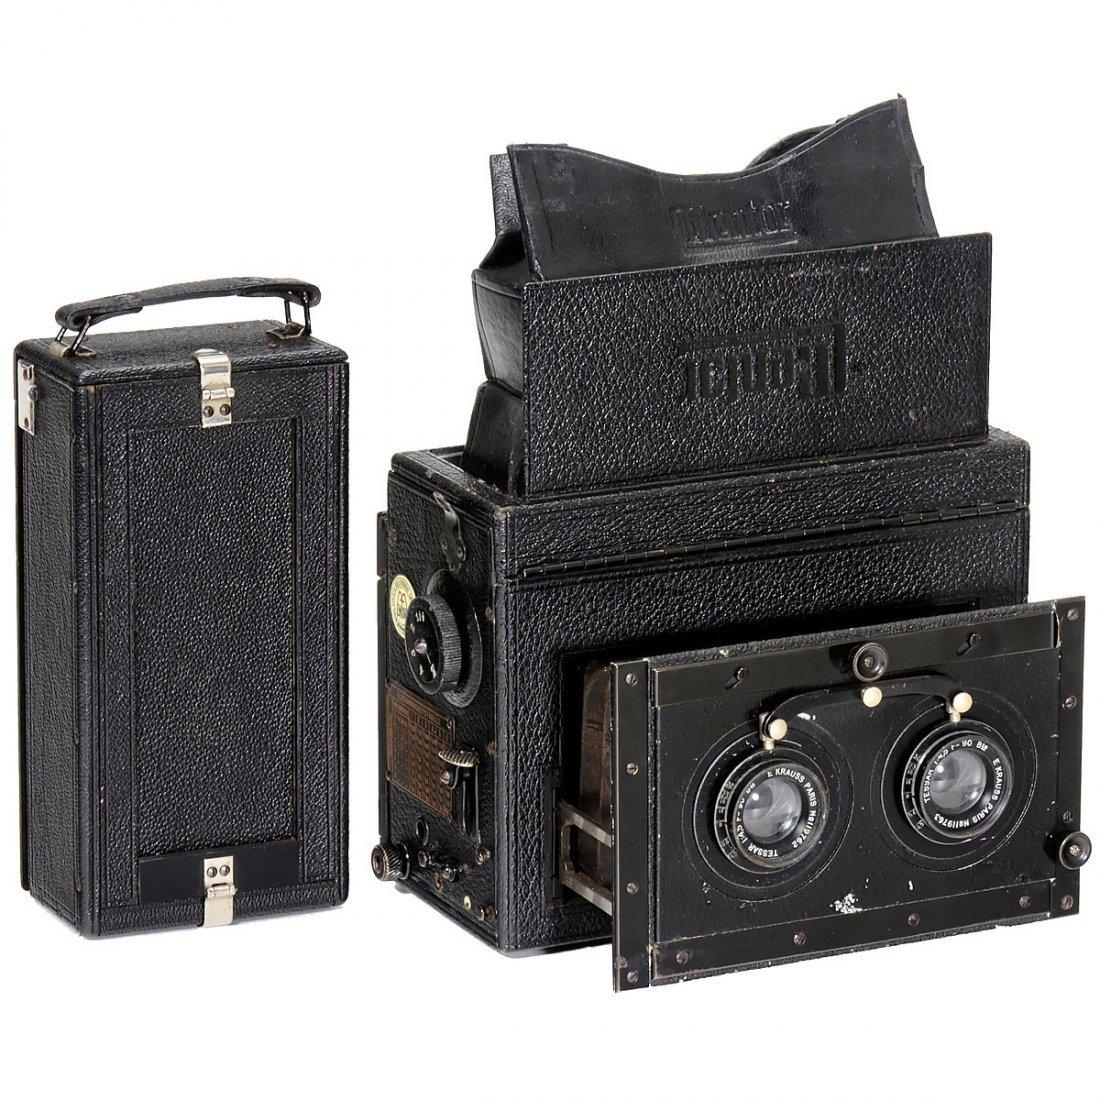 Mentor Stereo-Reflex 6 x 13, c. 1915